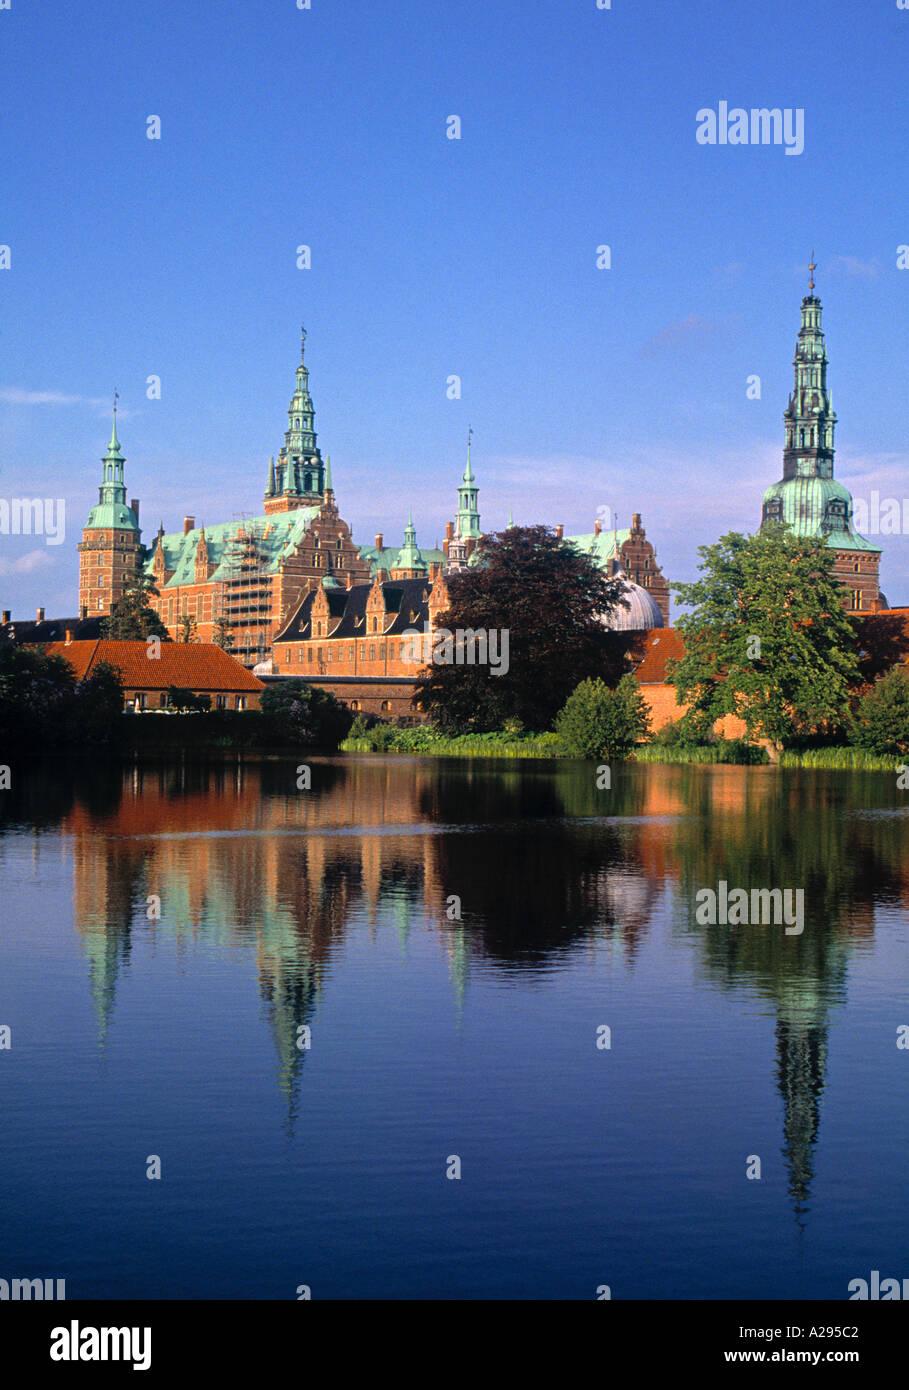 Frederiksborg Slot, Sjaelland, Denmark - Stock Image